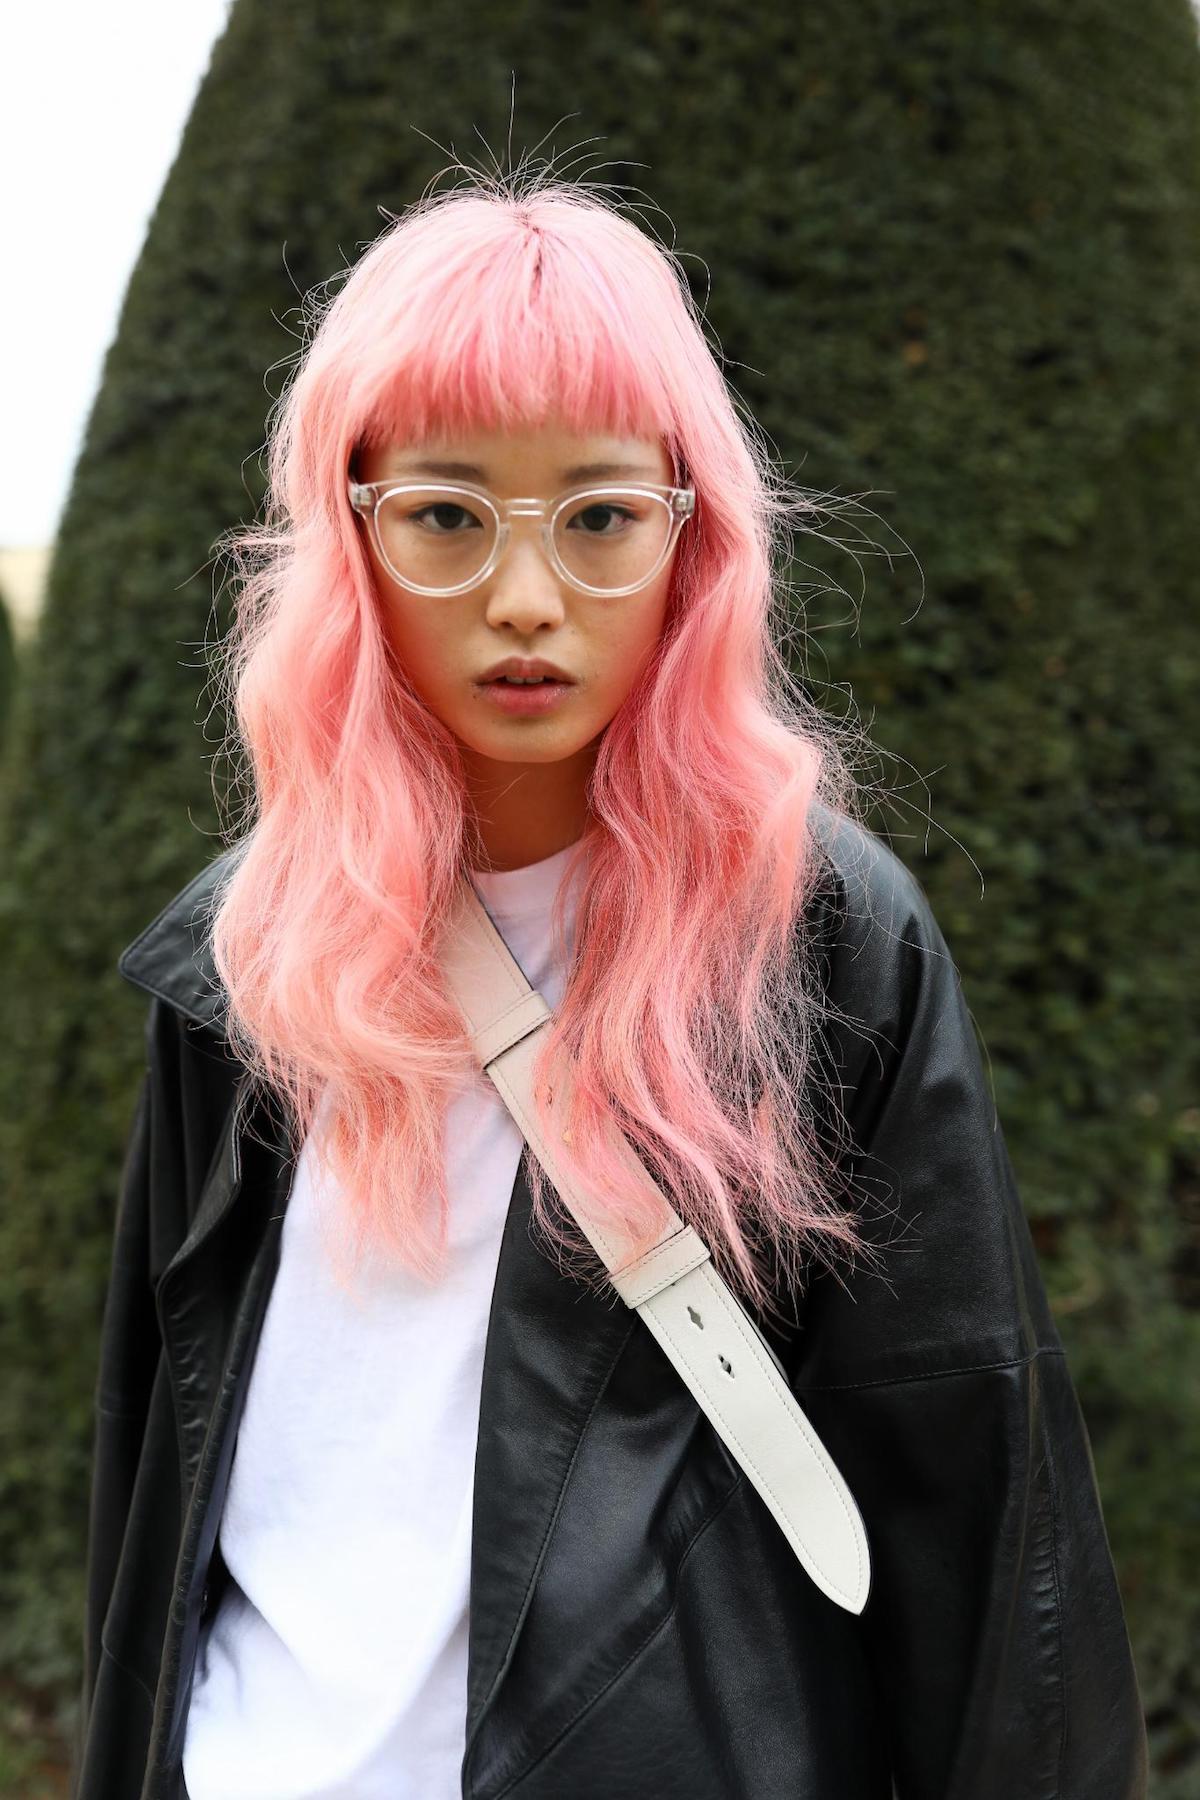 Rambut panjang ikal warna pink terang